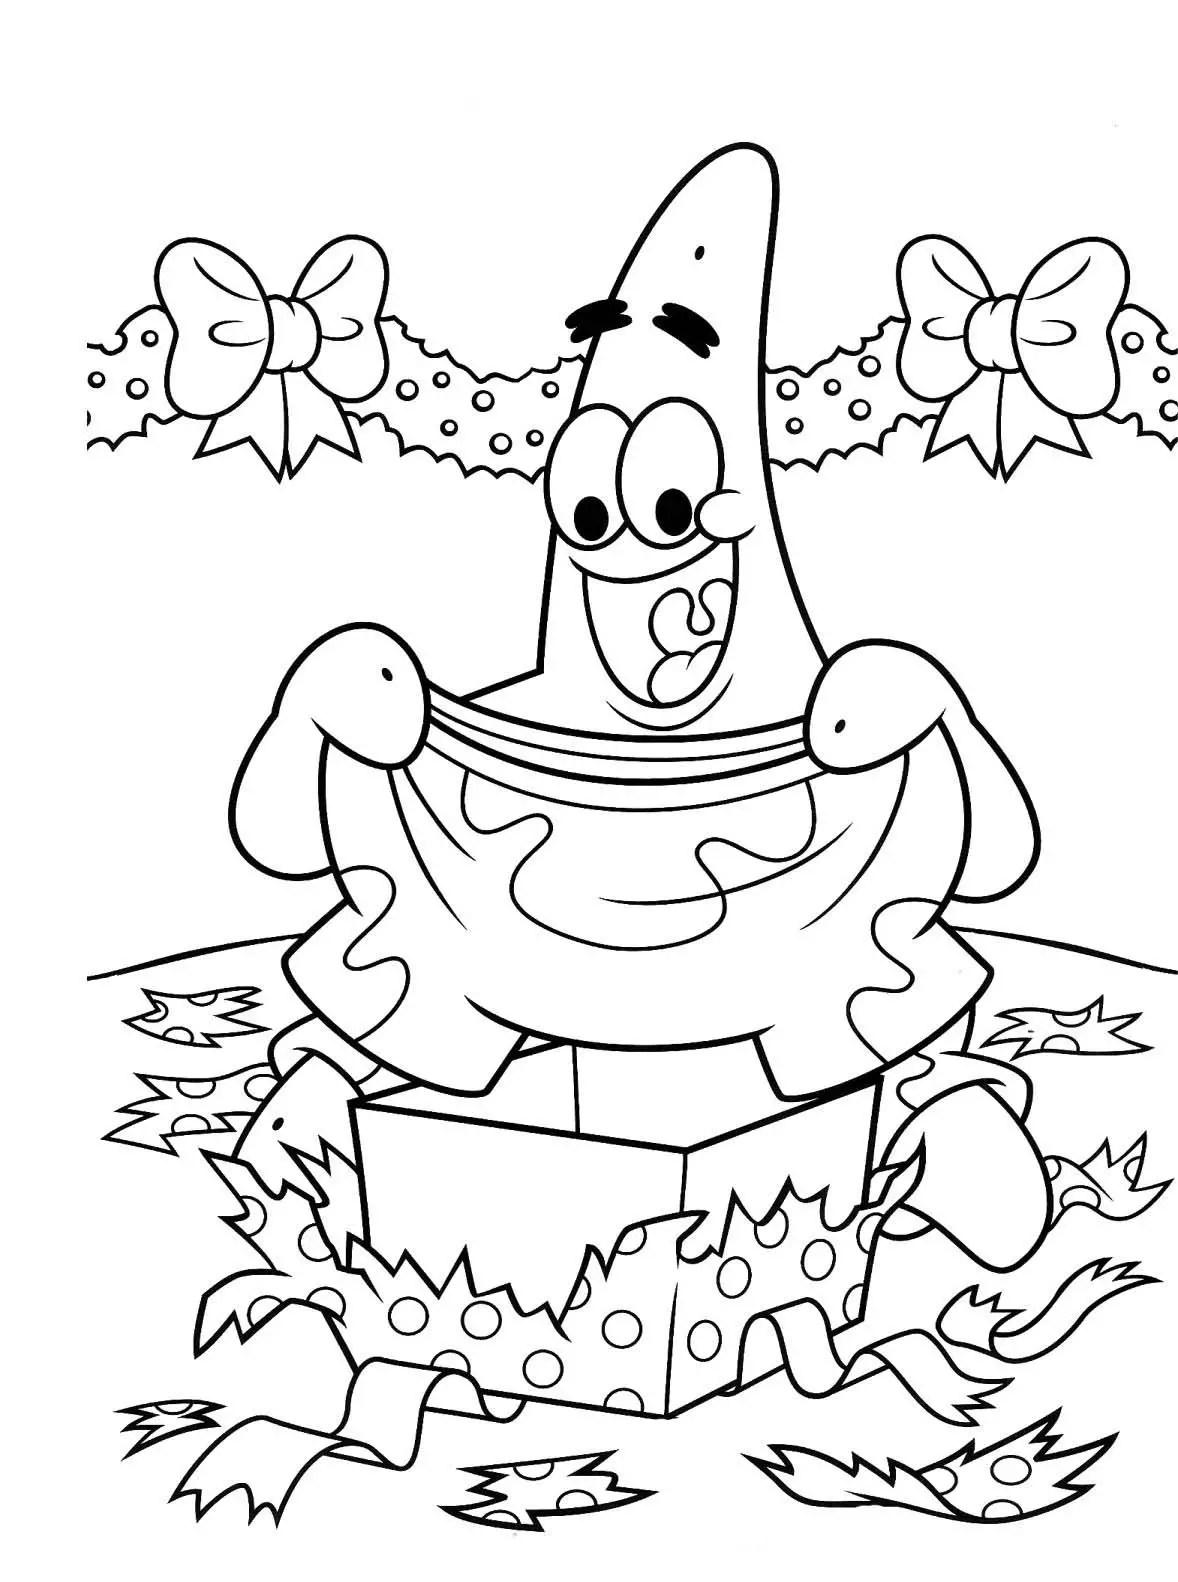 Dibujos Para Colorear Bob Esponja Navidad - Impresion gratuita